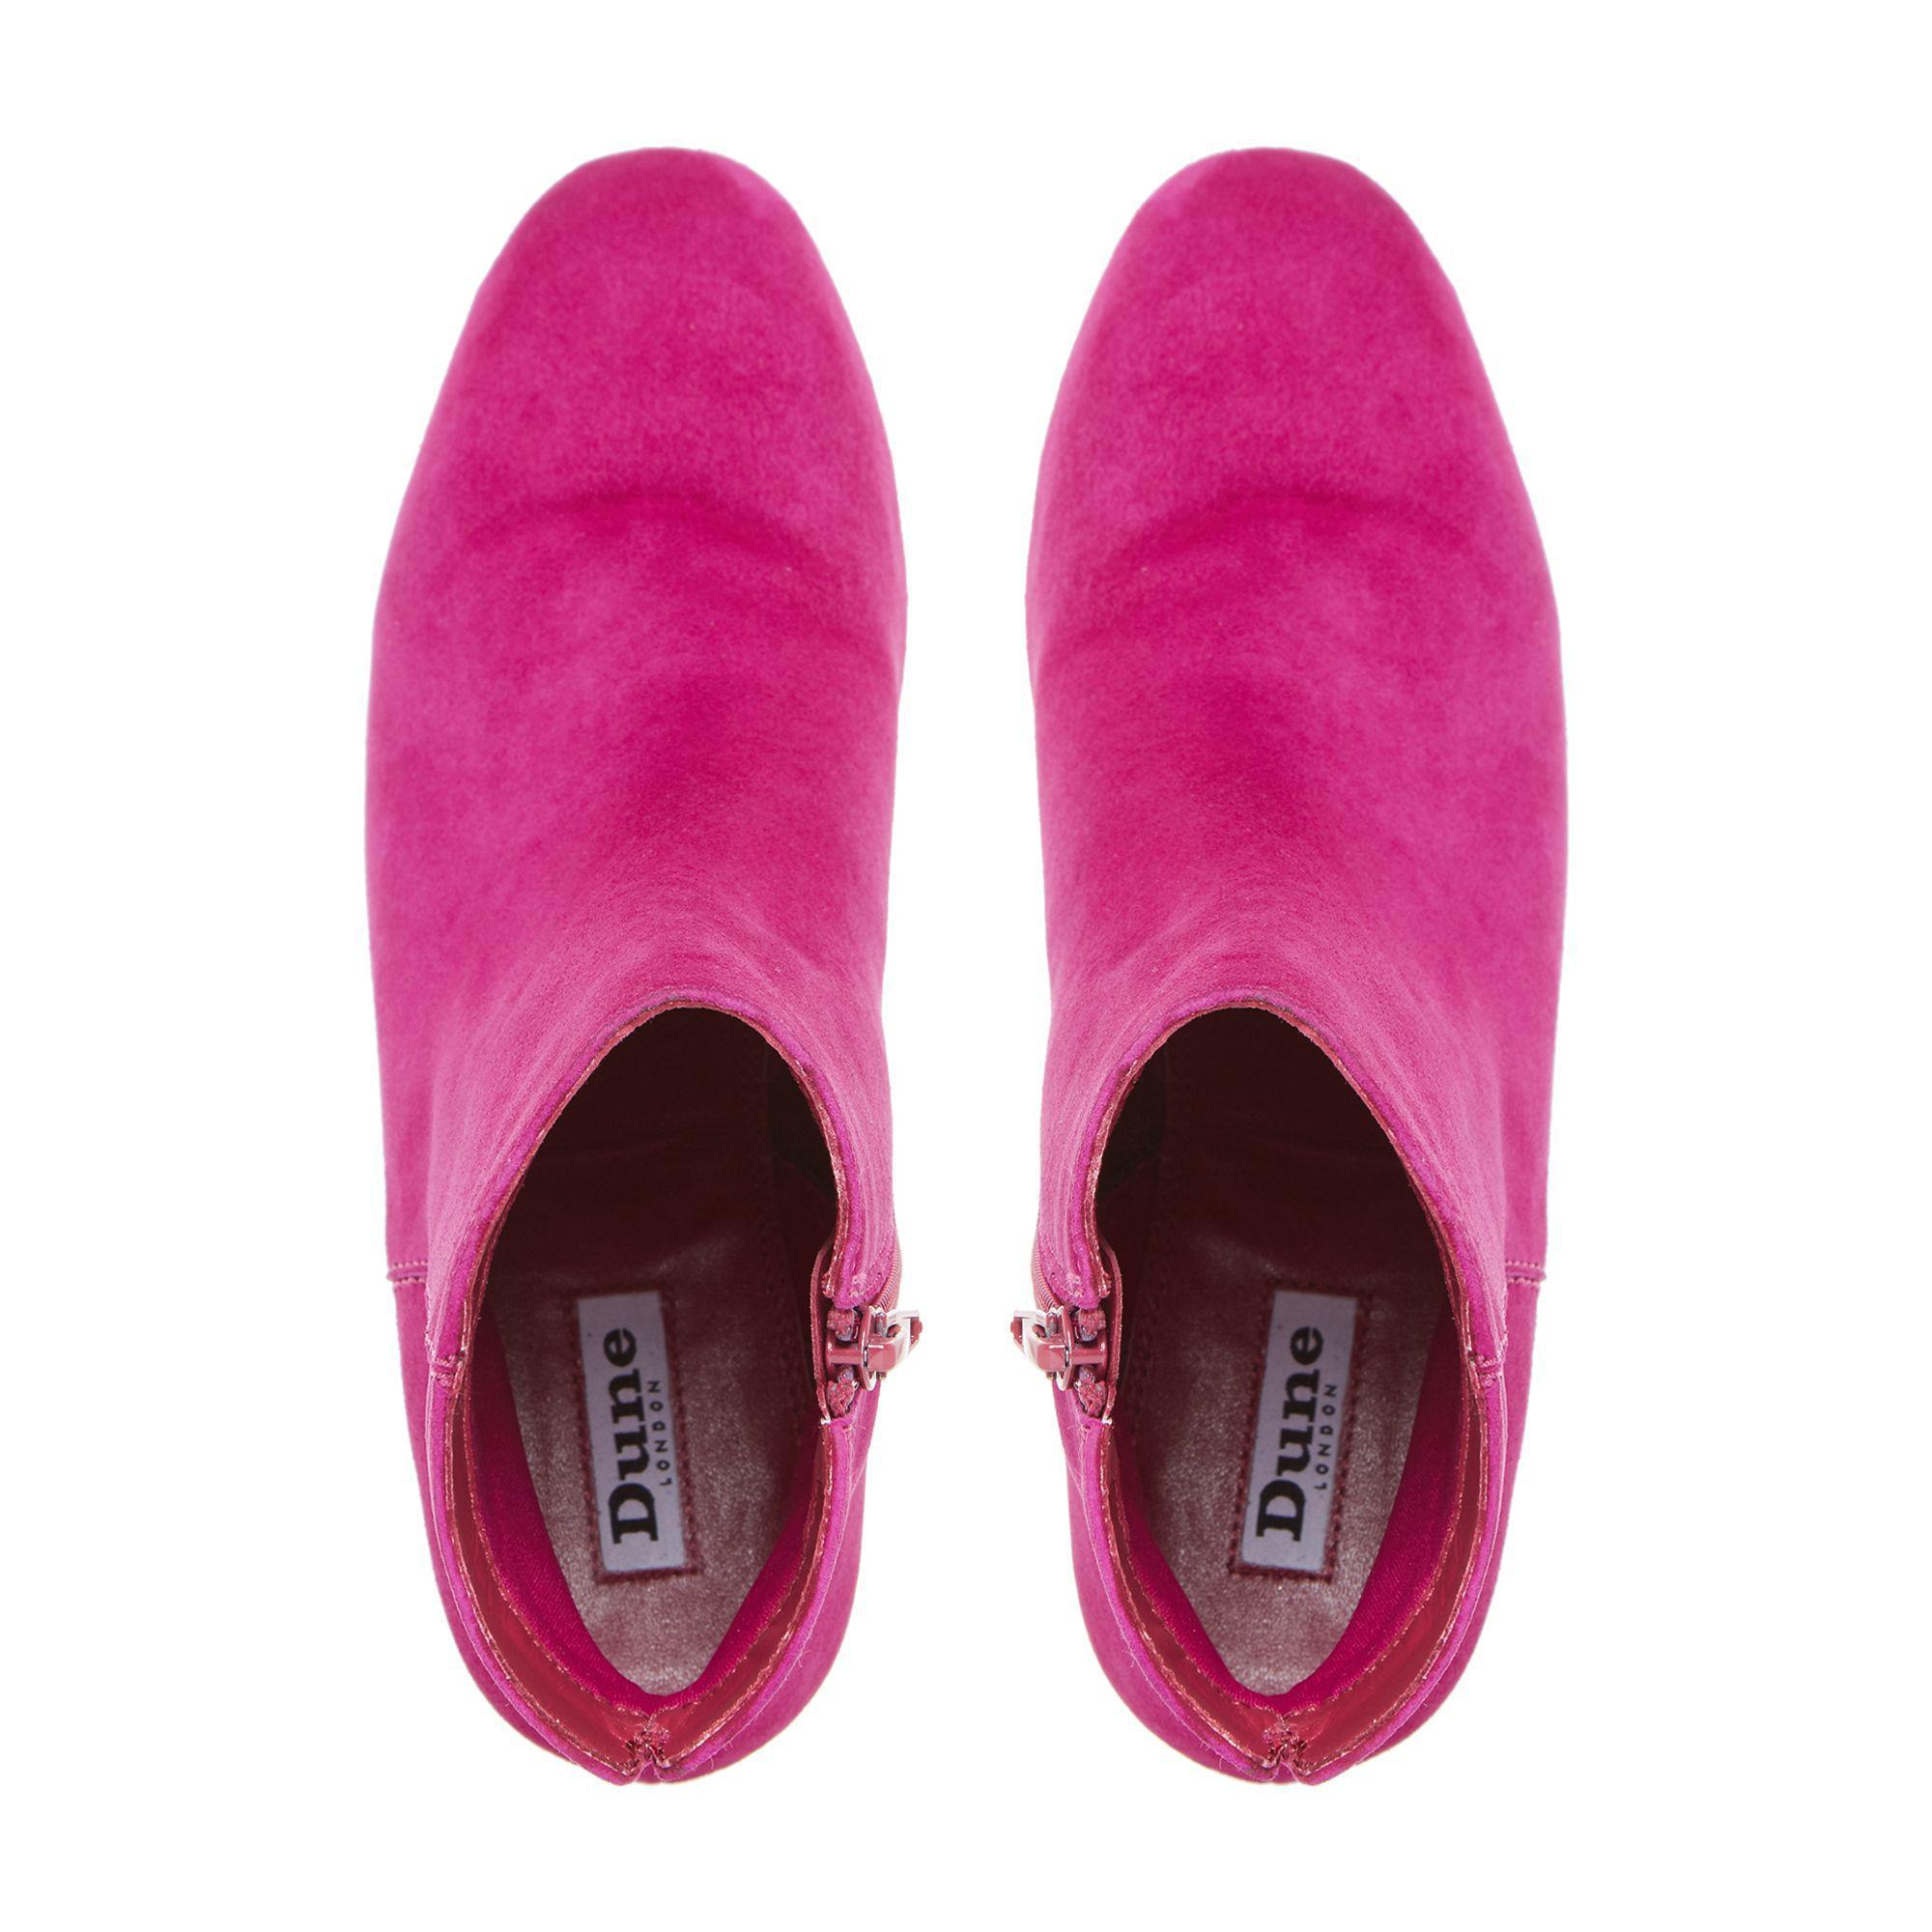 6ef267bcf34 Dune Pink  olyvea  Mid Block Heel Ankle Boots in Pink - Save 14% - Lyst